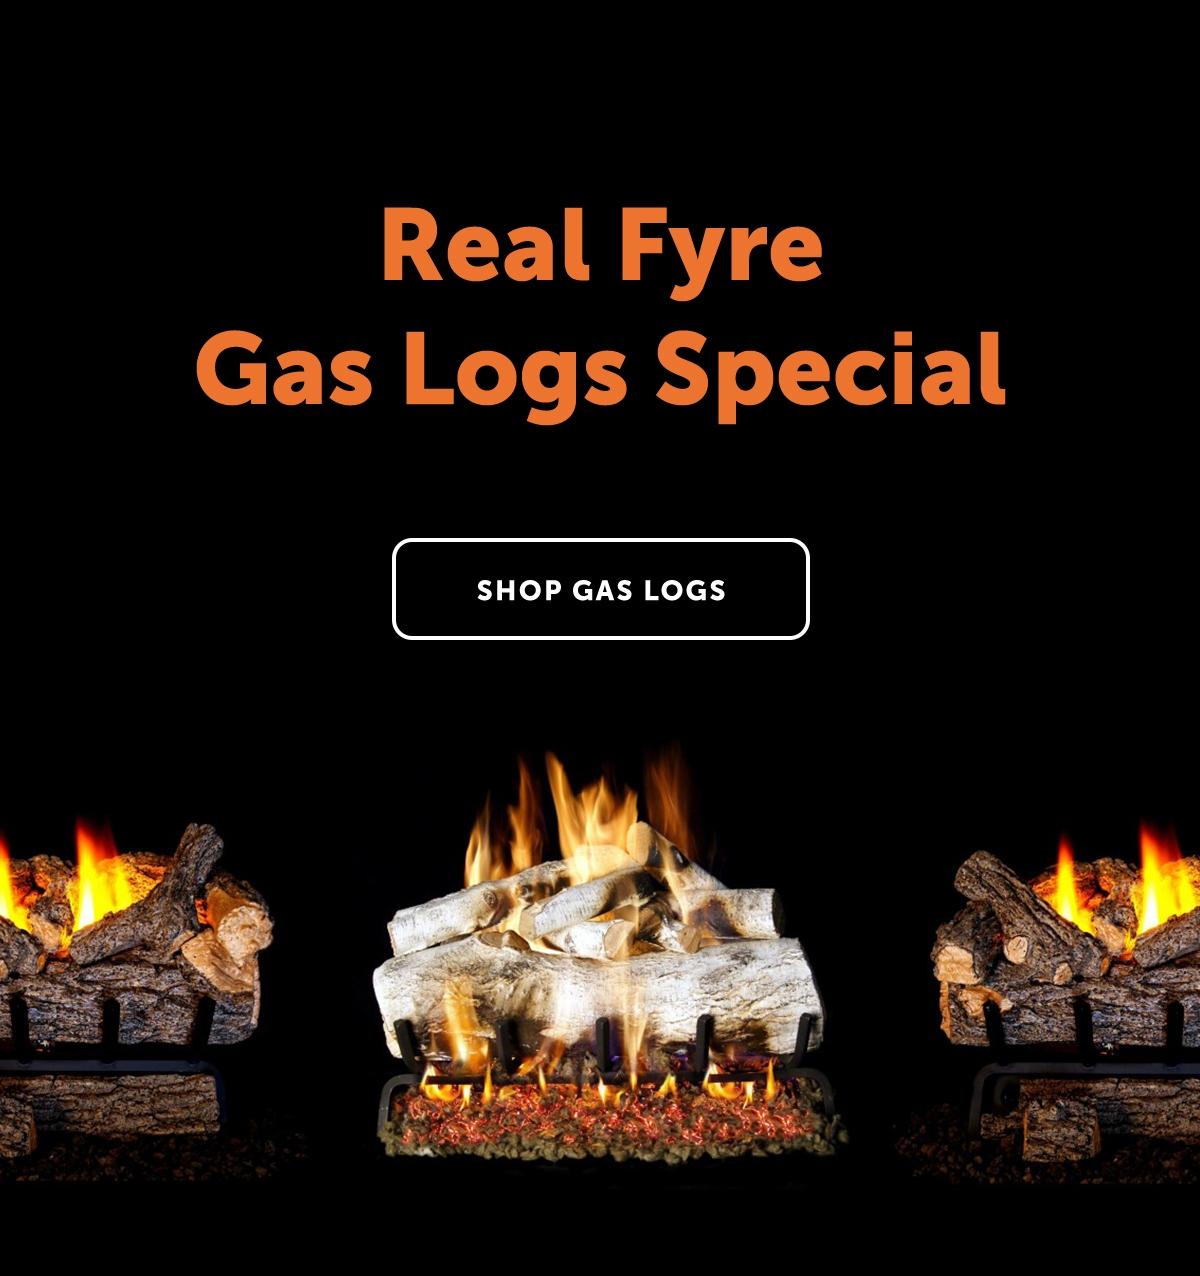 Real Fyre Gas Logs Special   Shop Gas Logs